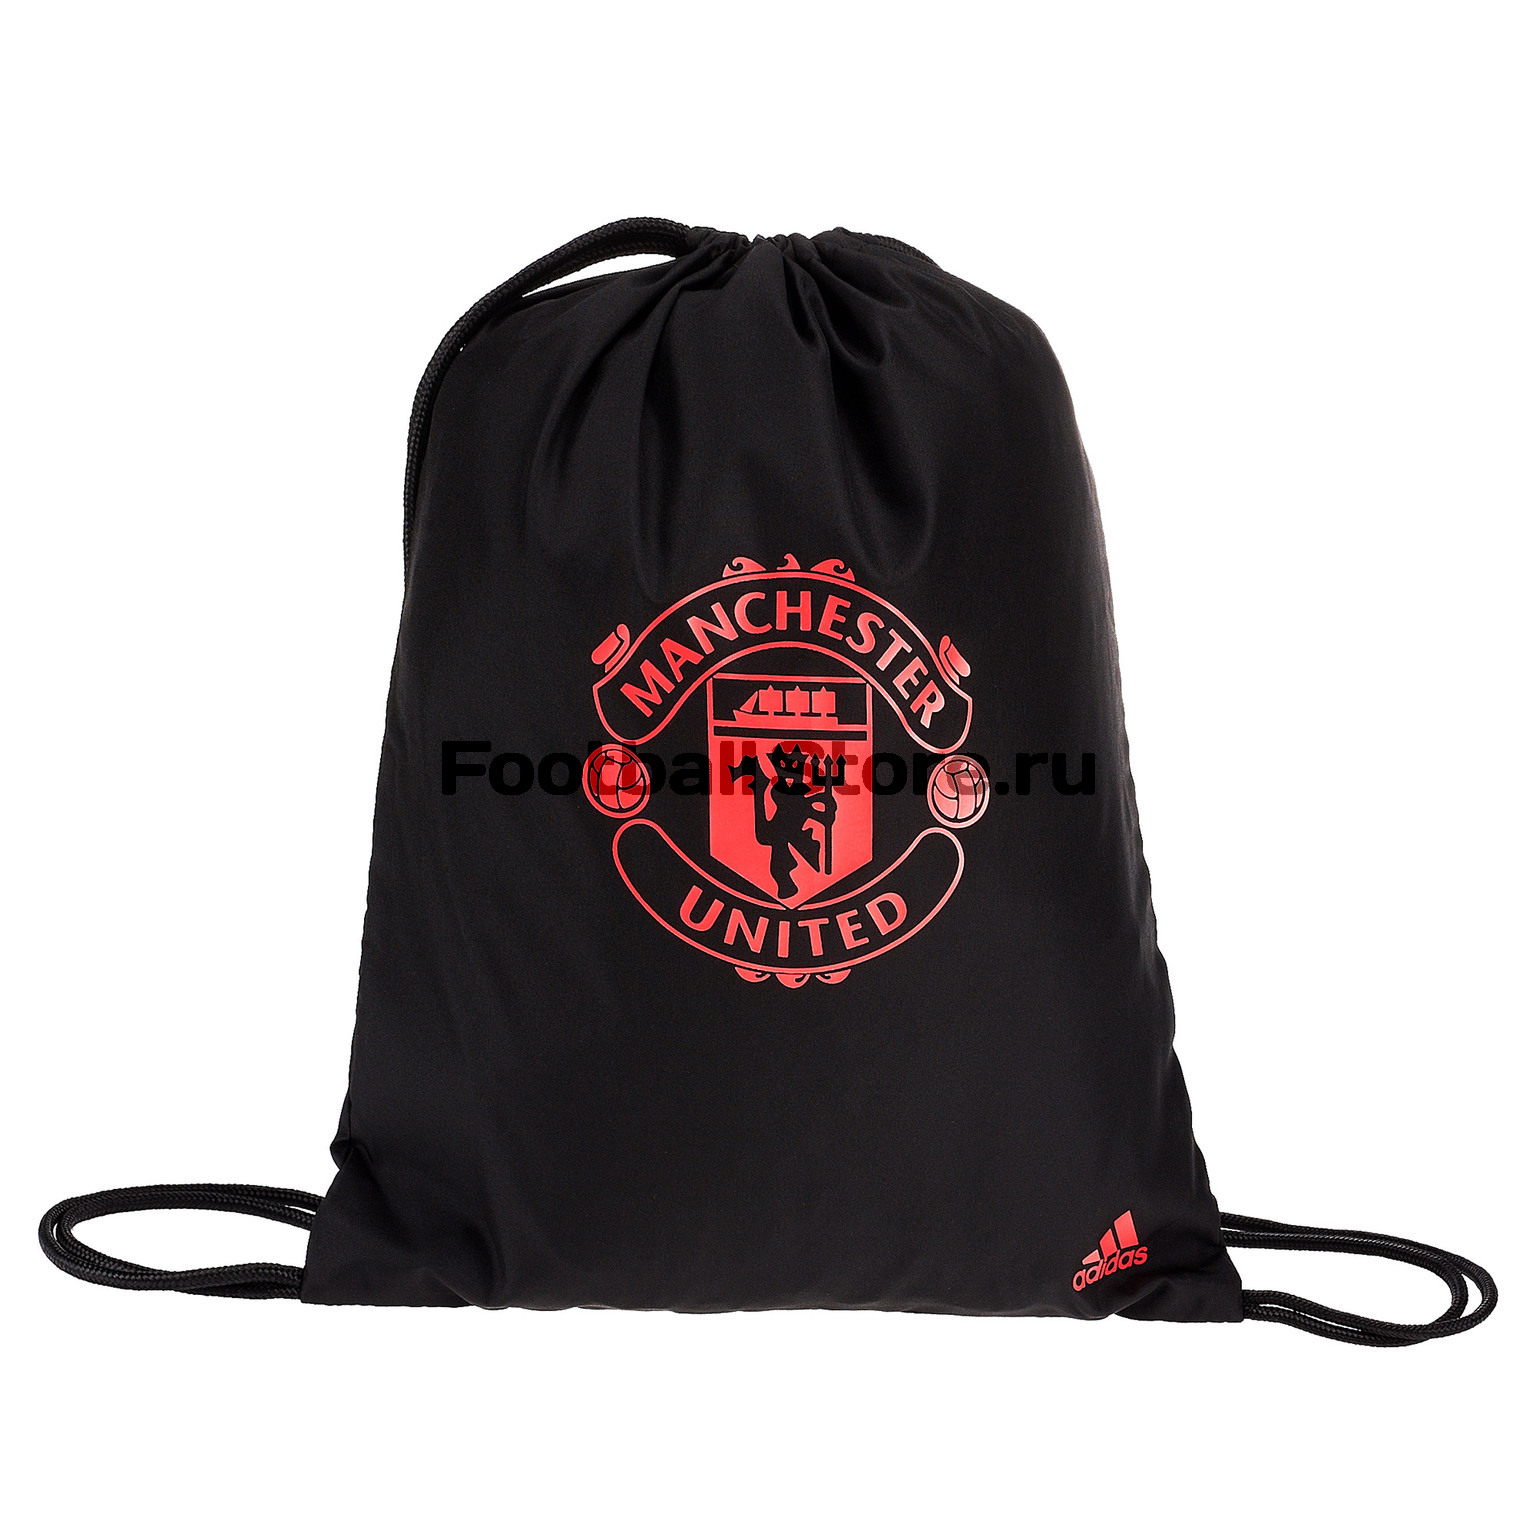 Сумка для обуви Adidas Manchester United 2018/19 сумка adidas manchester united 2018 19